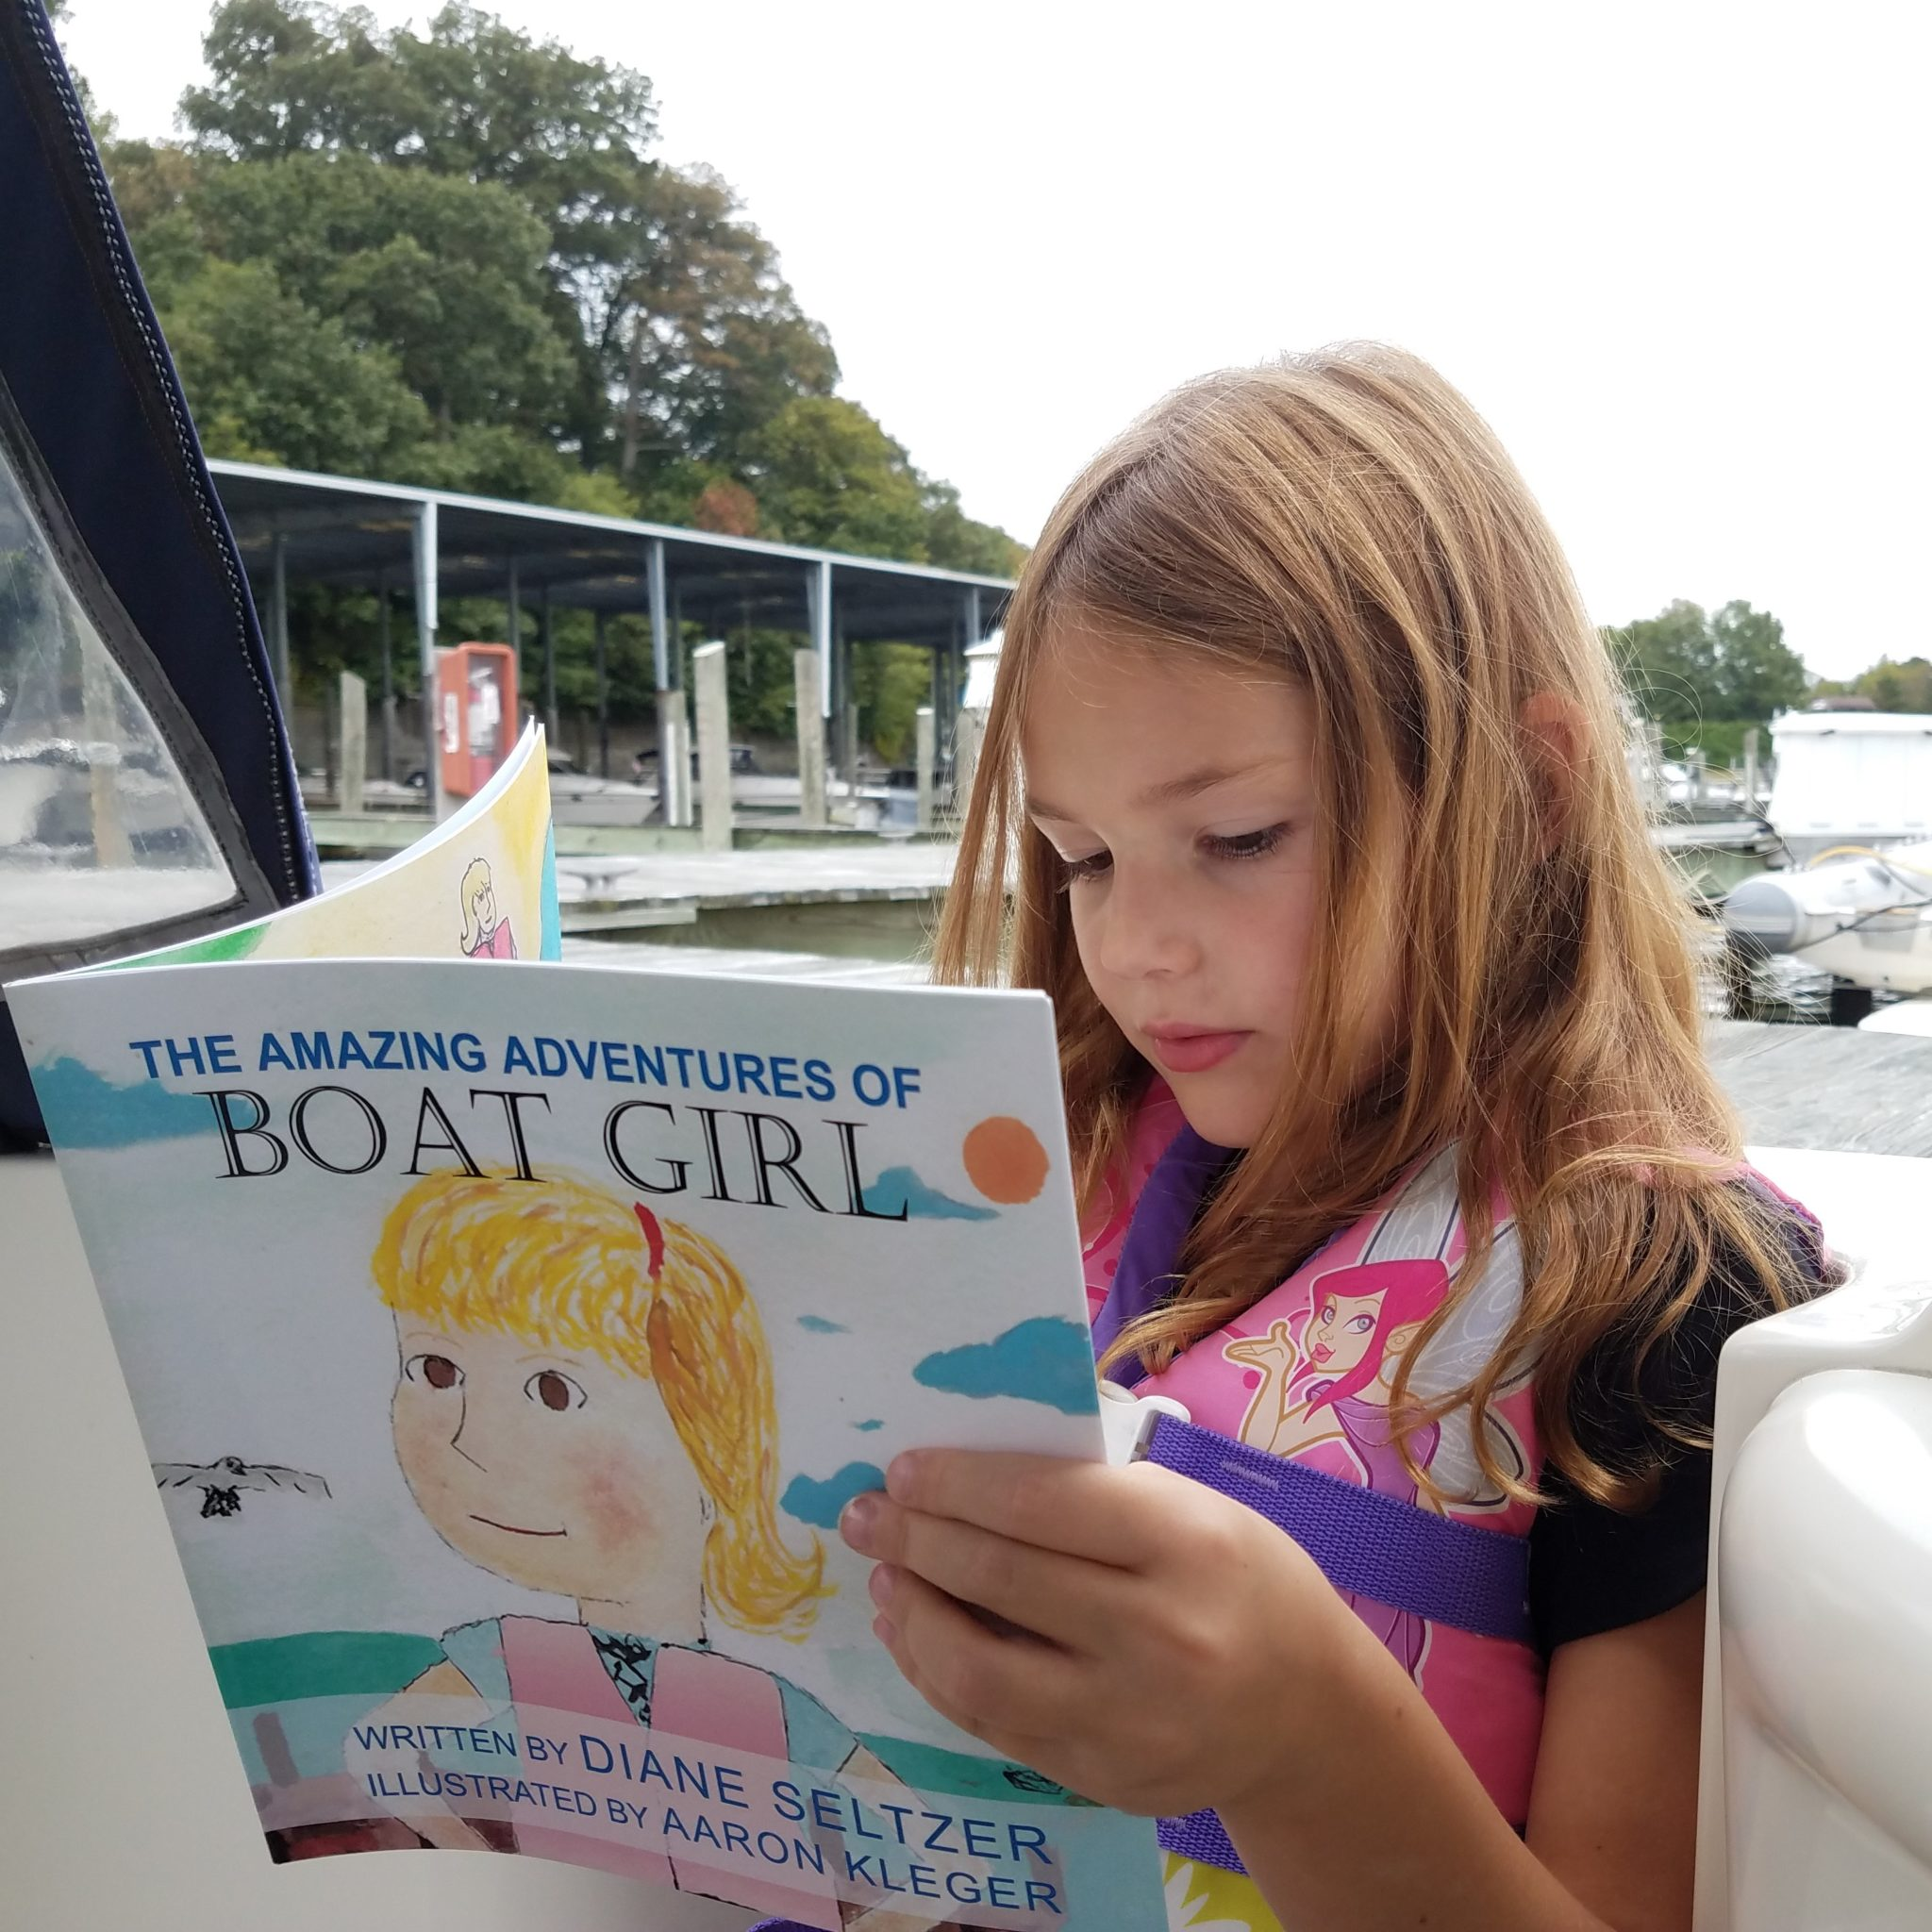 The Amazing Adventures of Boat Girl